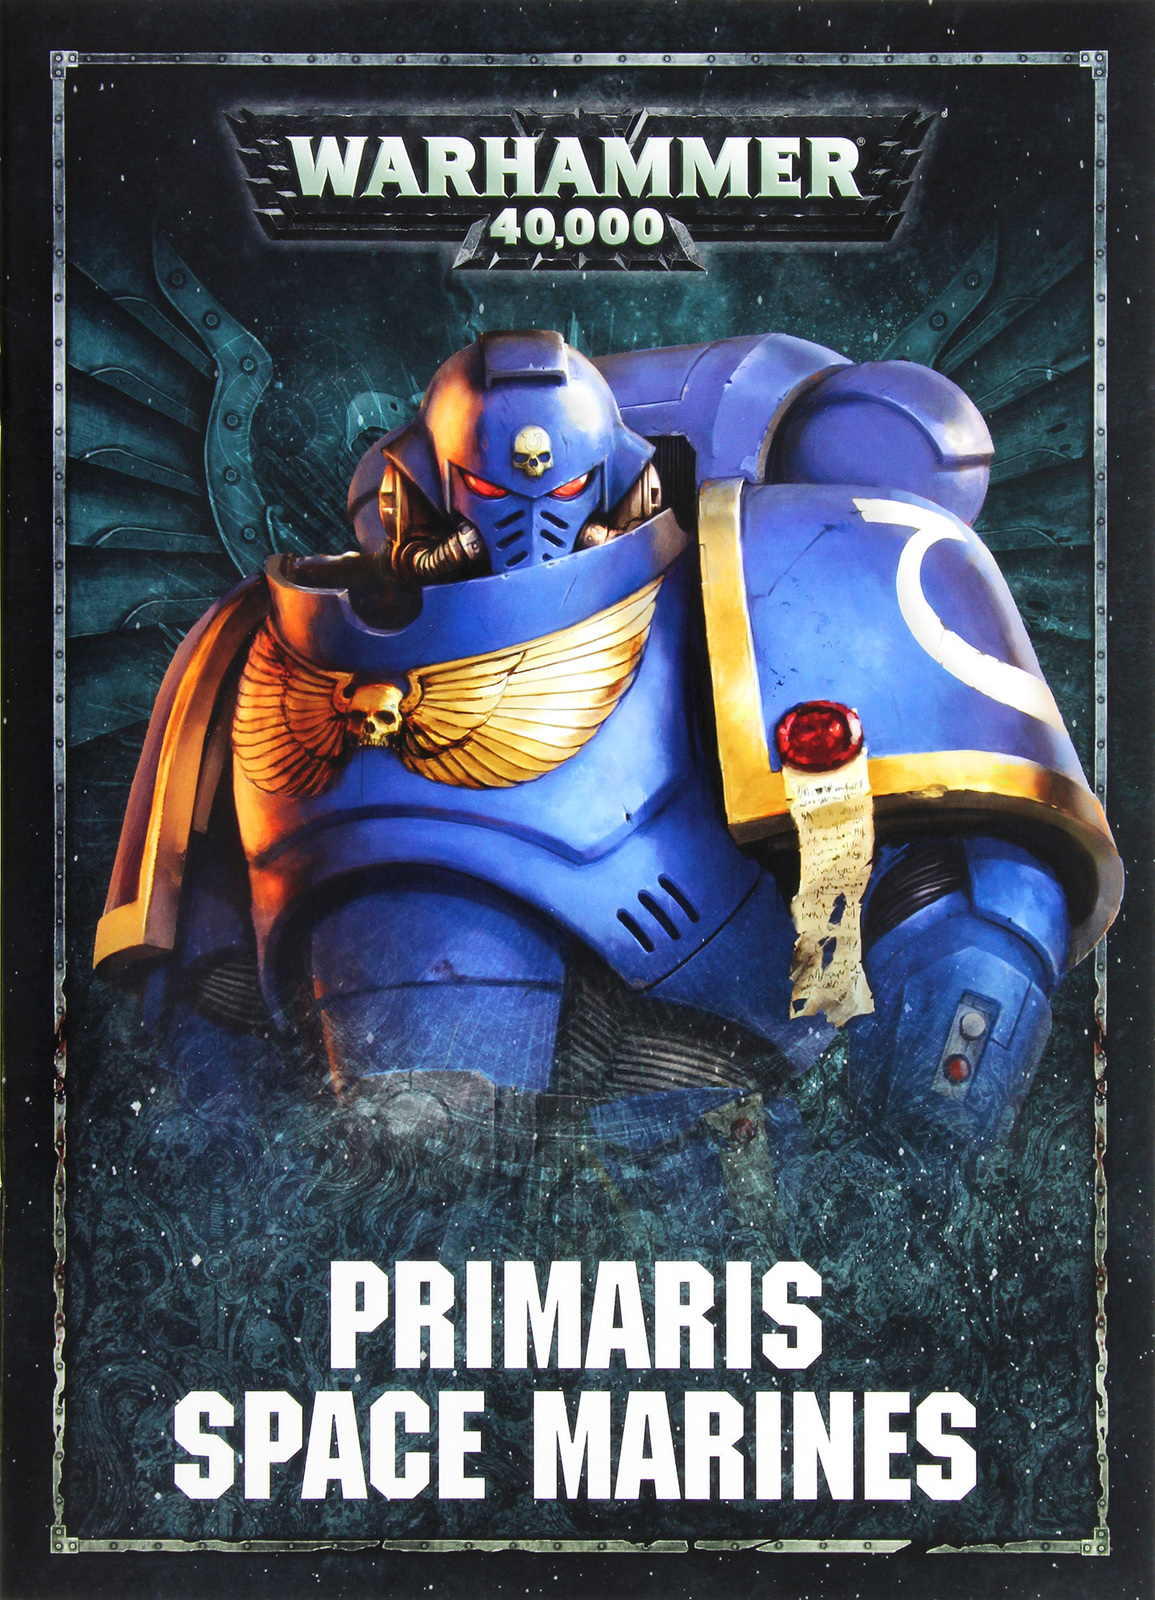 Warhammer 40,000: Dark Imperium Boxed Set image